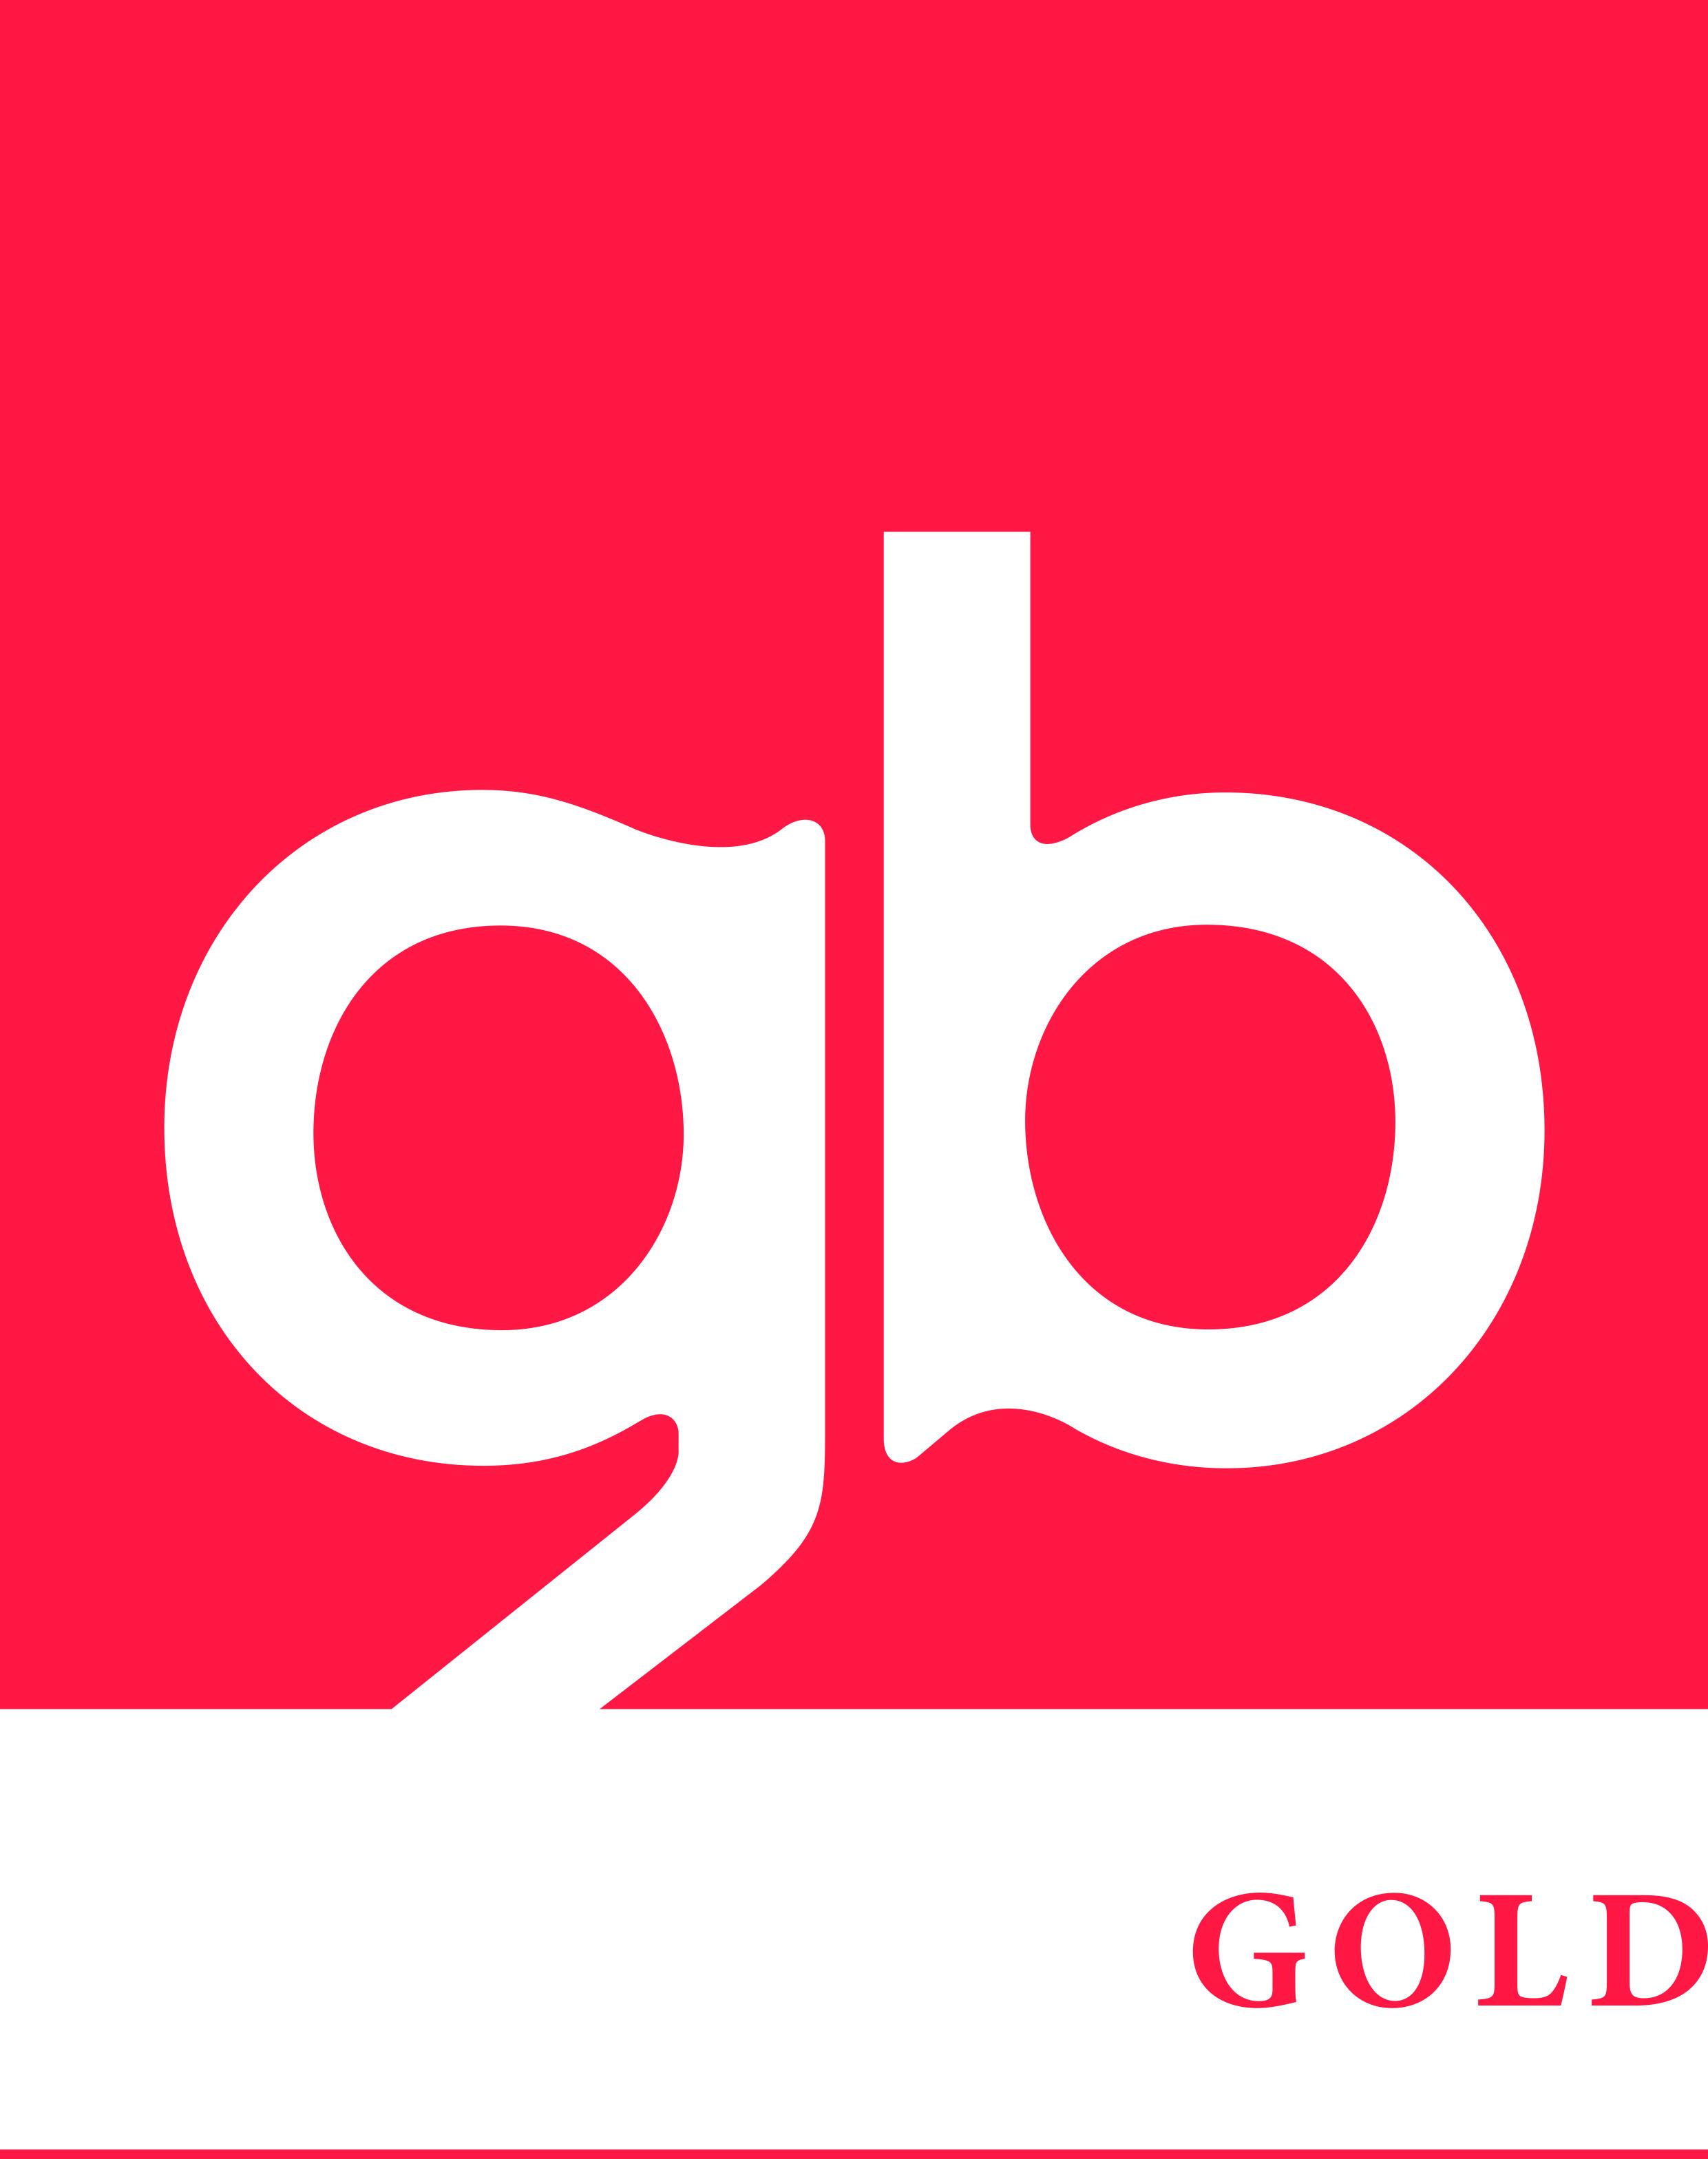 GB Gold